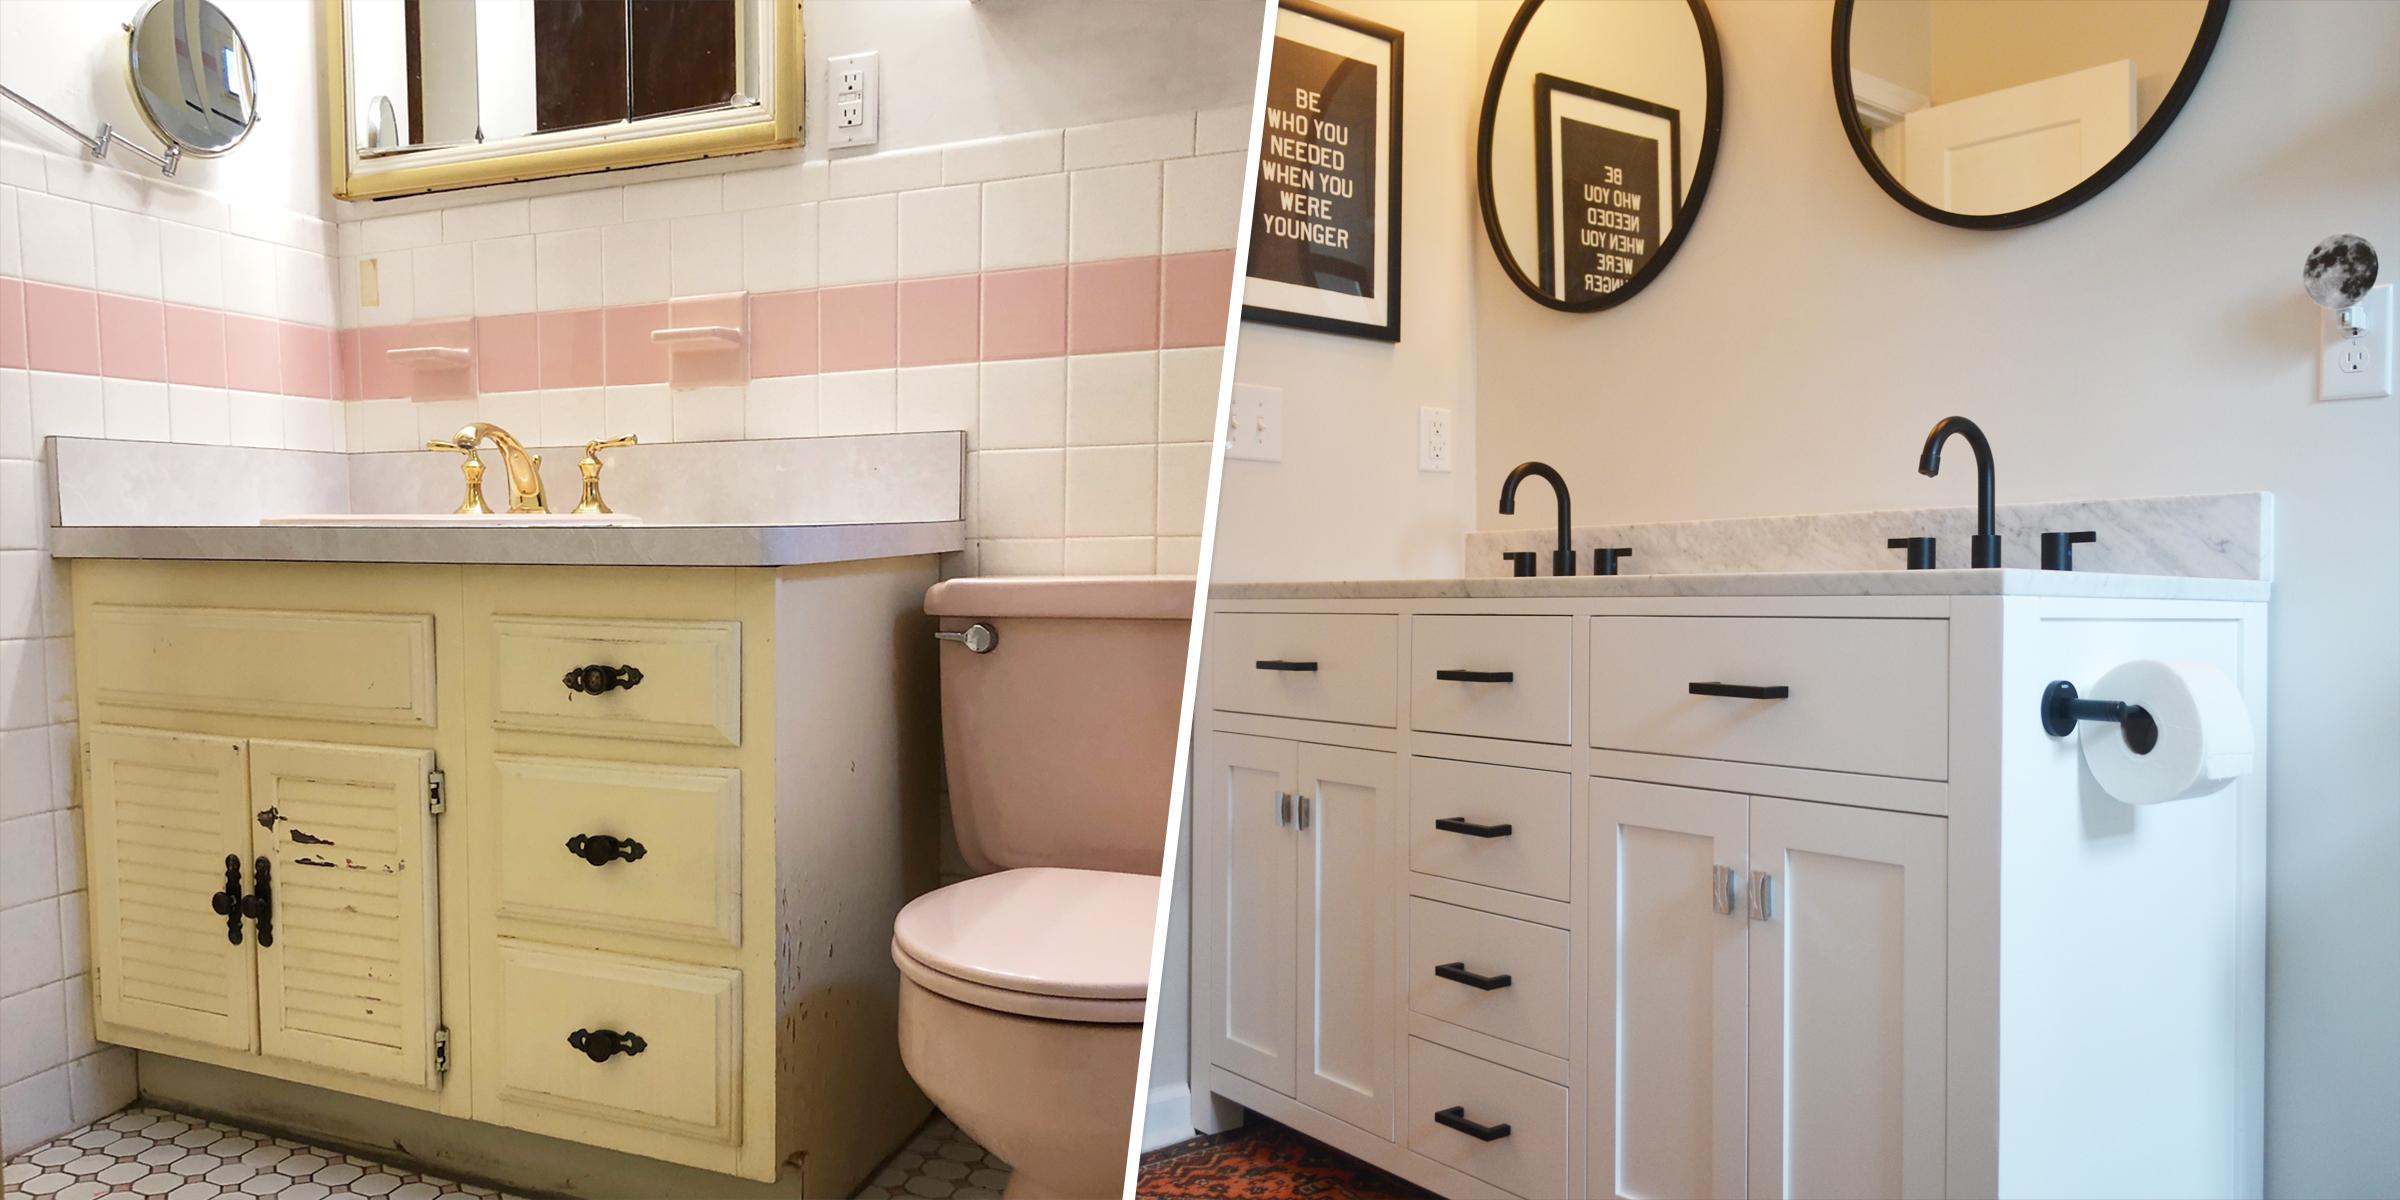 Bathroom Renovation During Coronavirus, Redoing My Bathroom